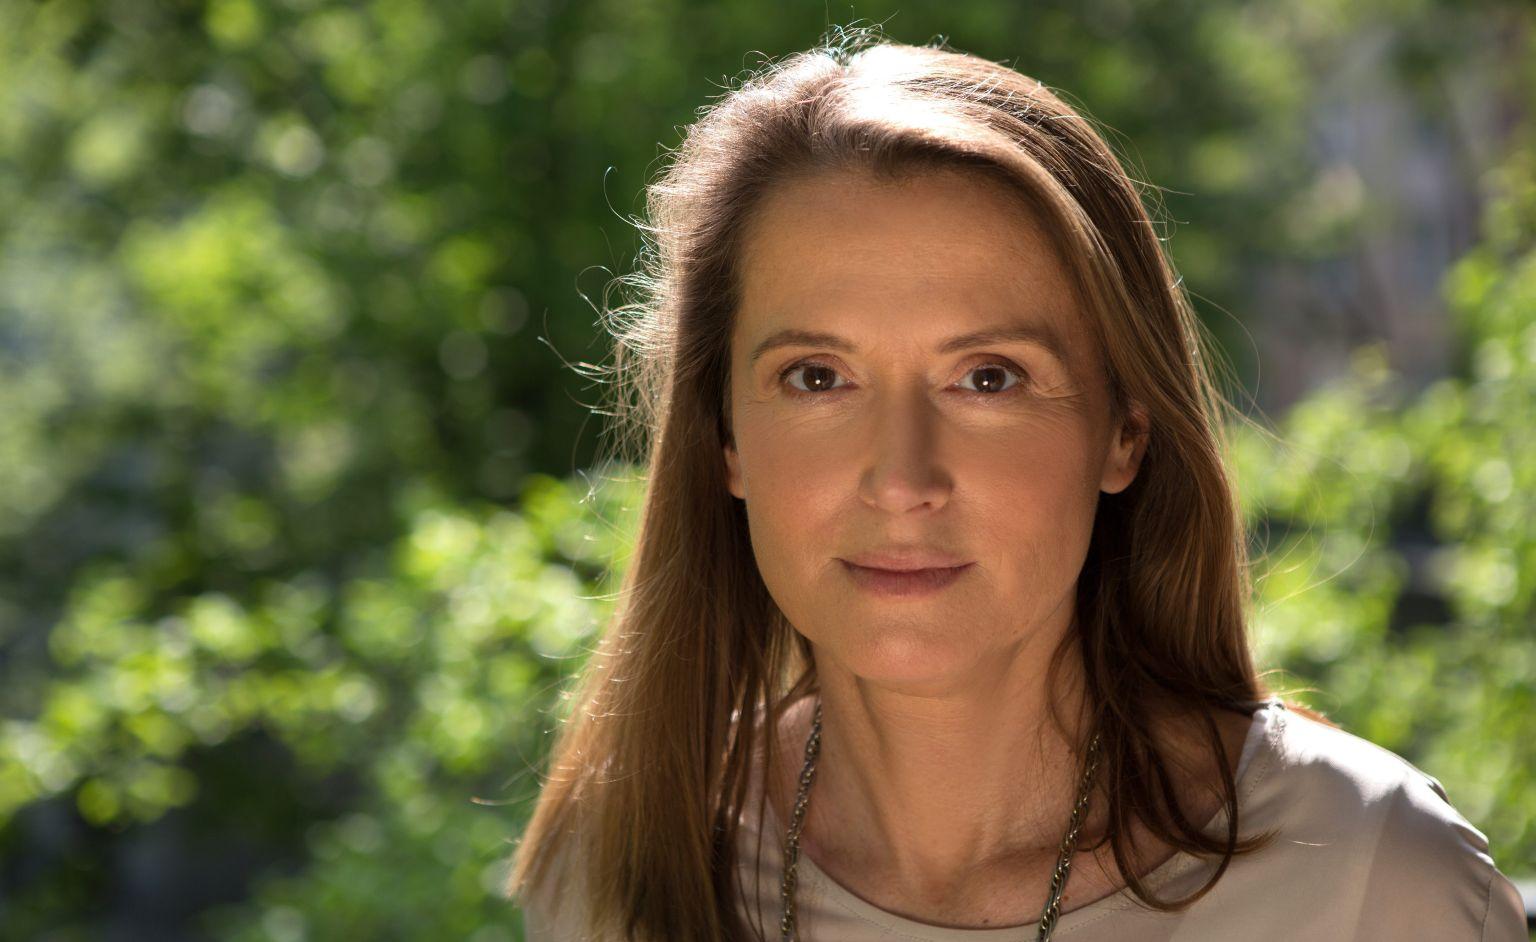 g28.04.2014 Warszawa. Dziennikarka i projektantka Monika JaruzelskaFot. Albert Zawada / Agencja Gazeta